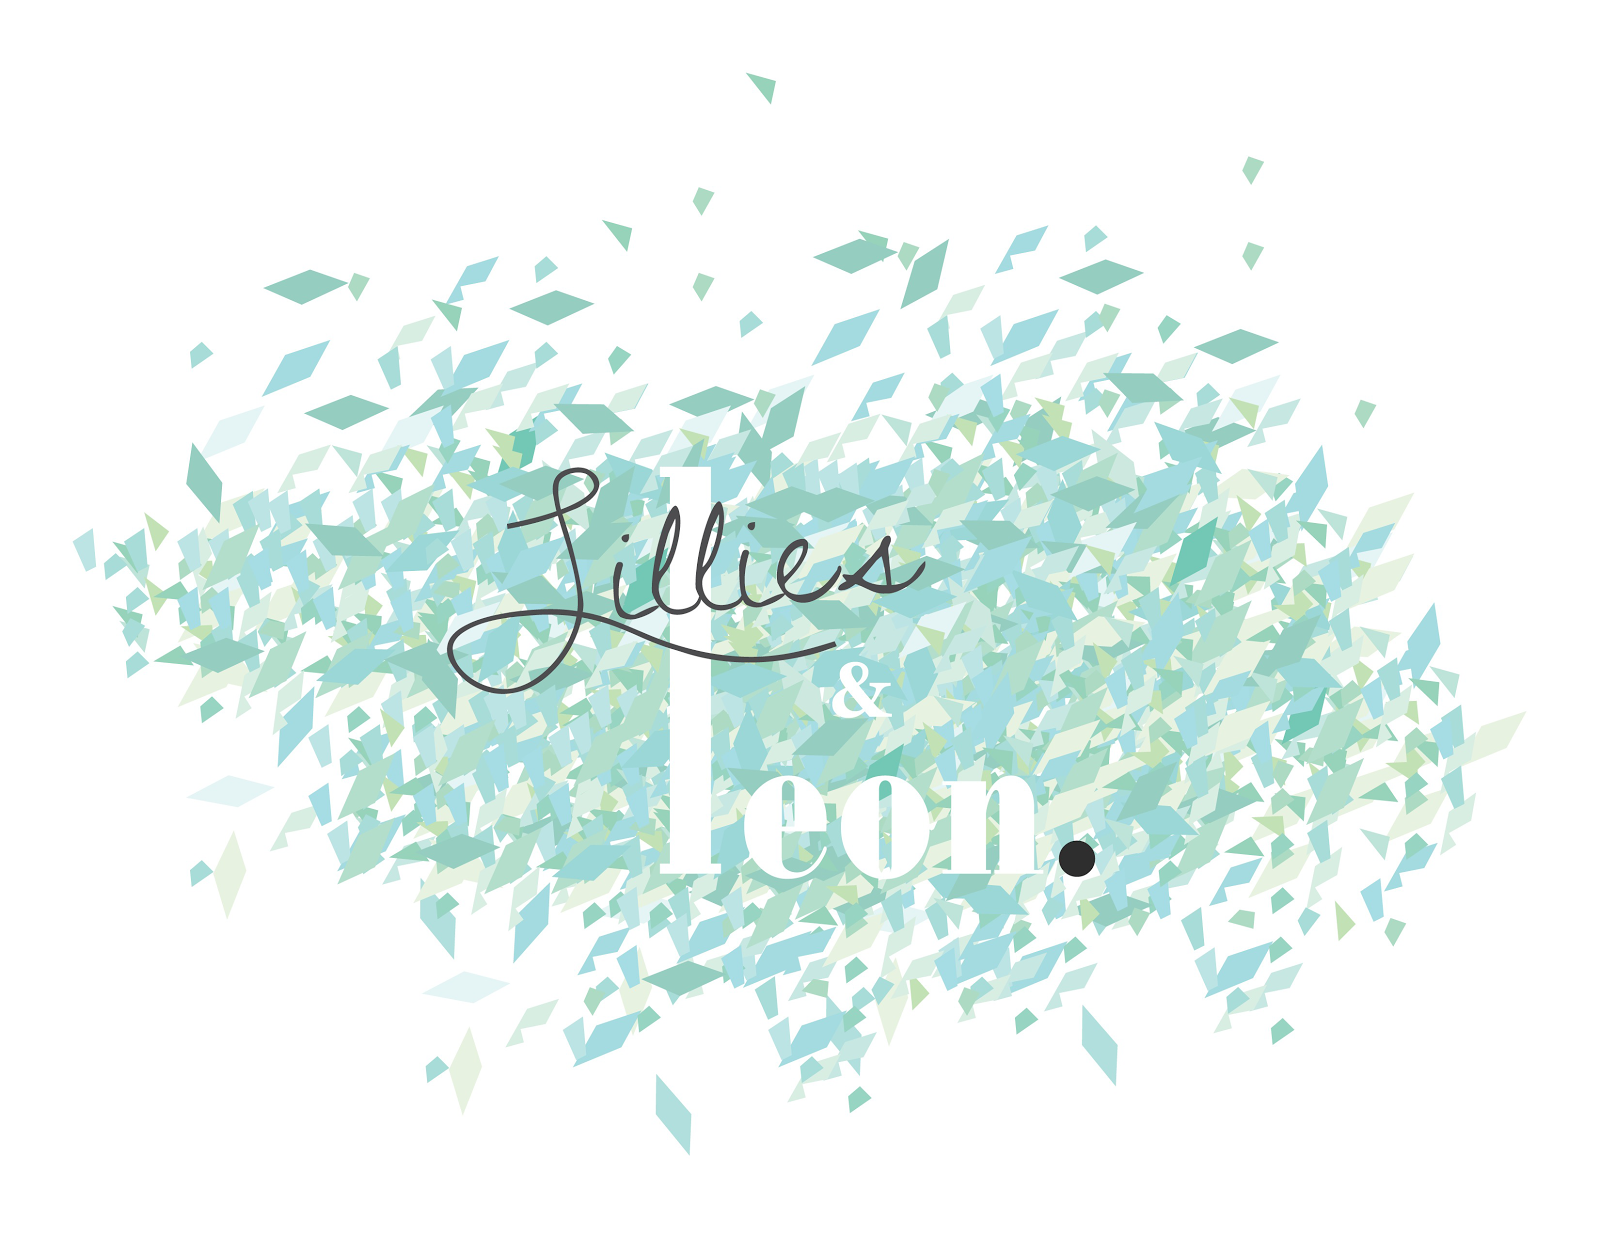 Lillies & Leon